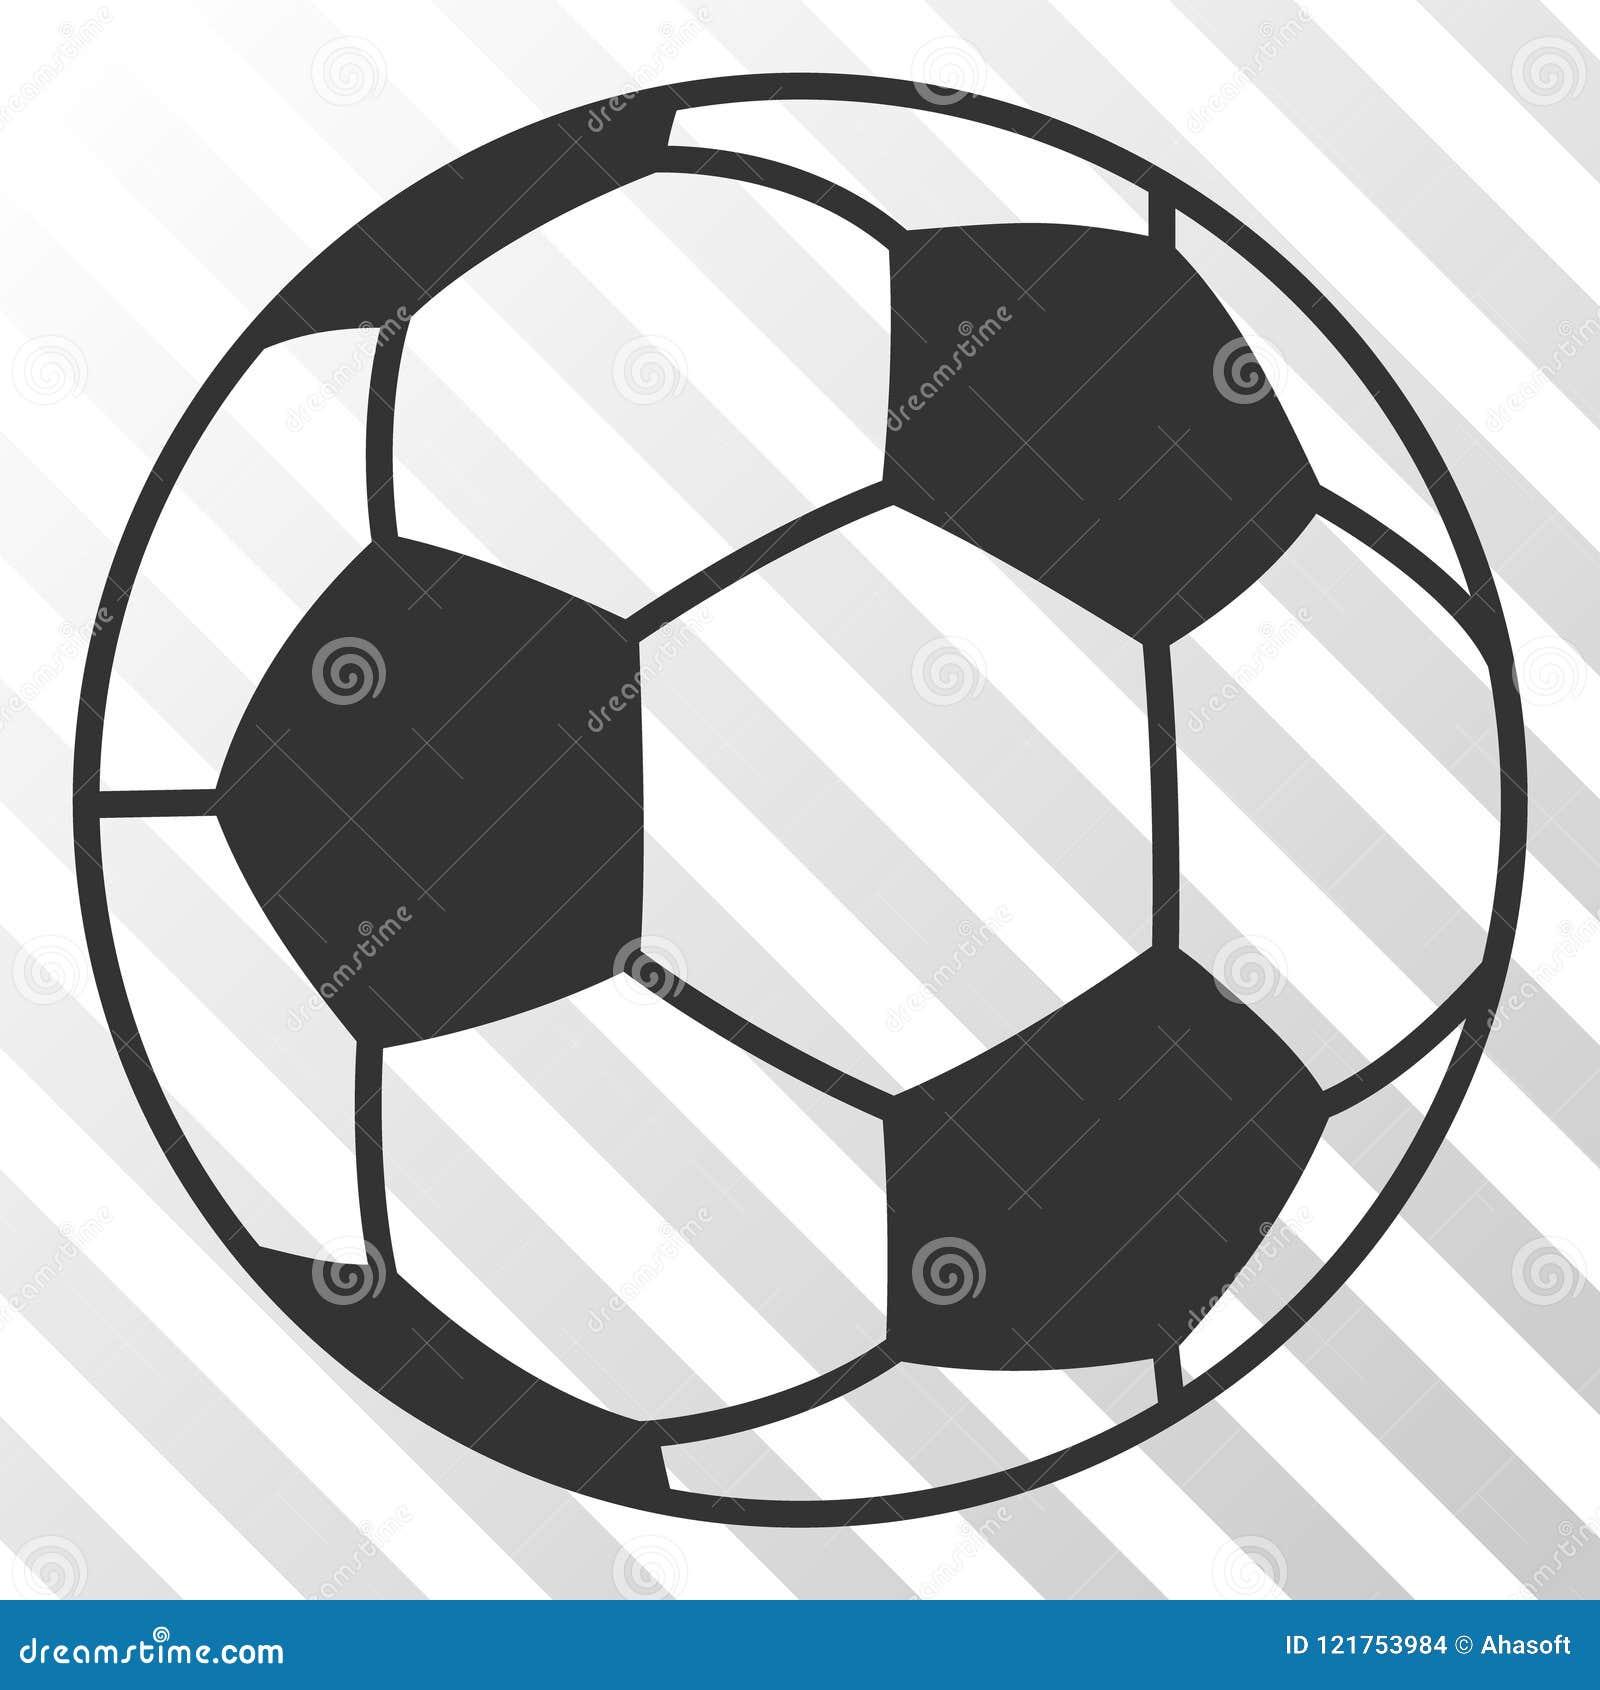 Football Ball Vector Eps Icon Stock Vector Illustration Of